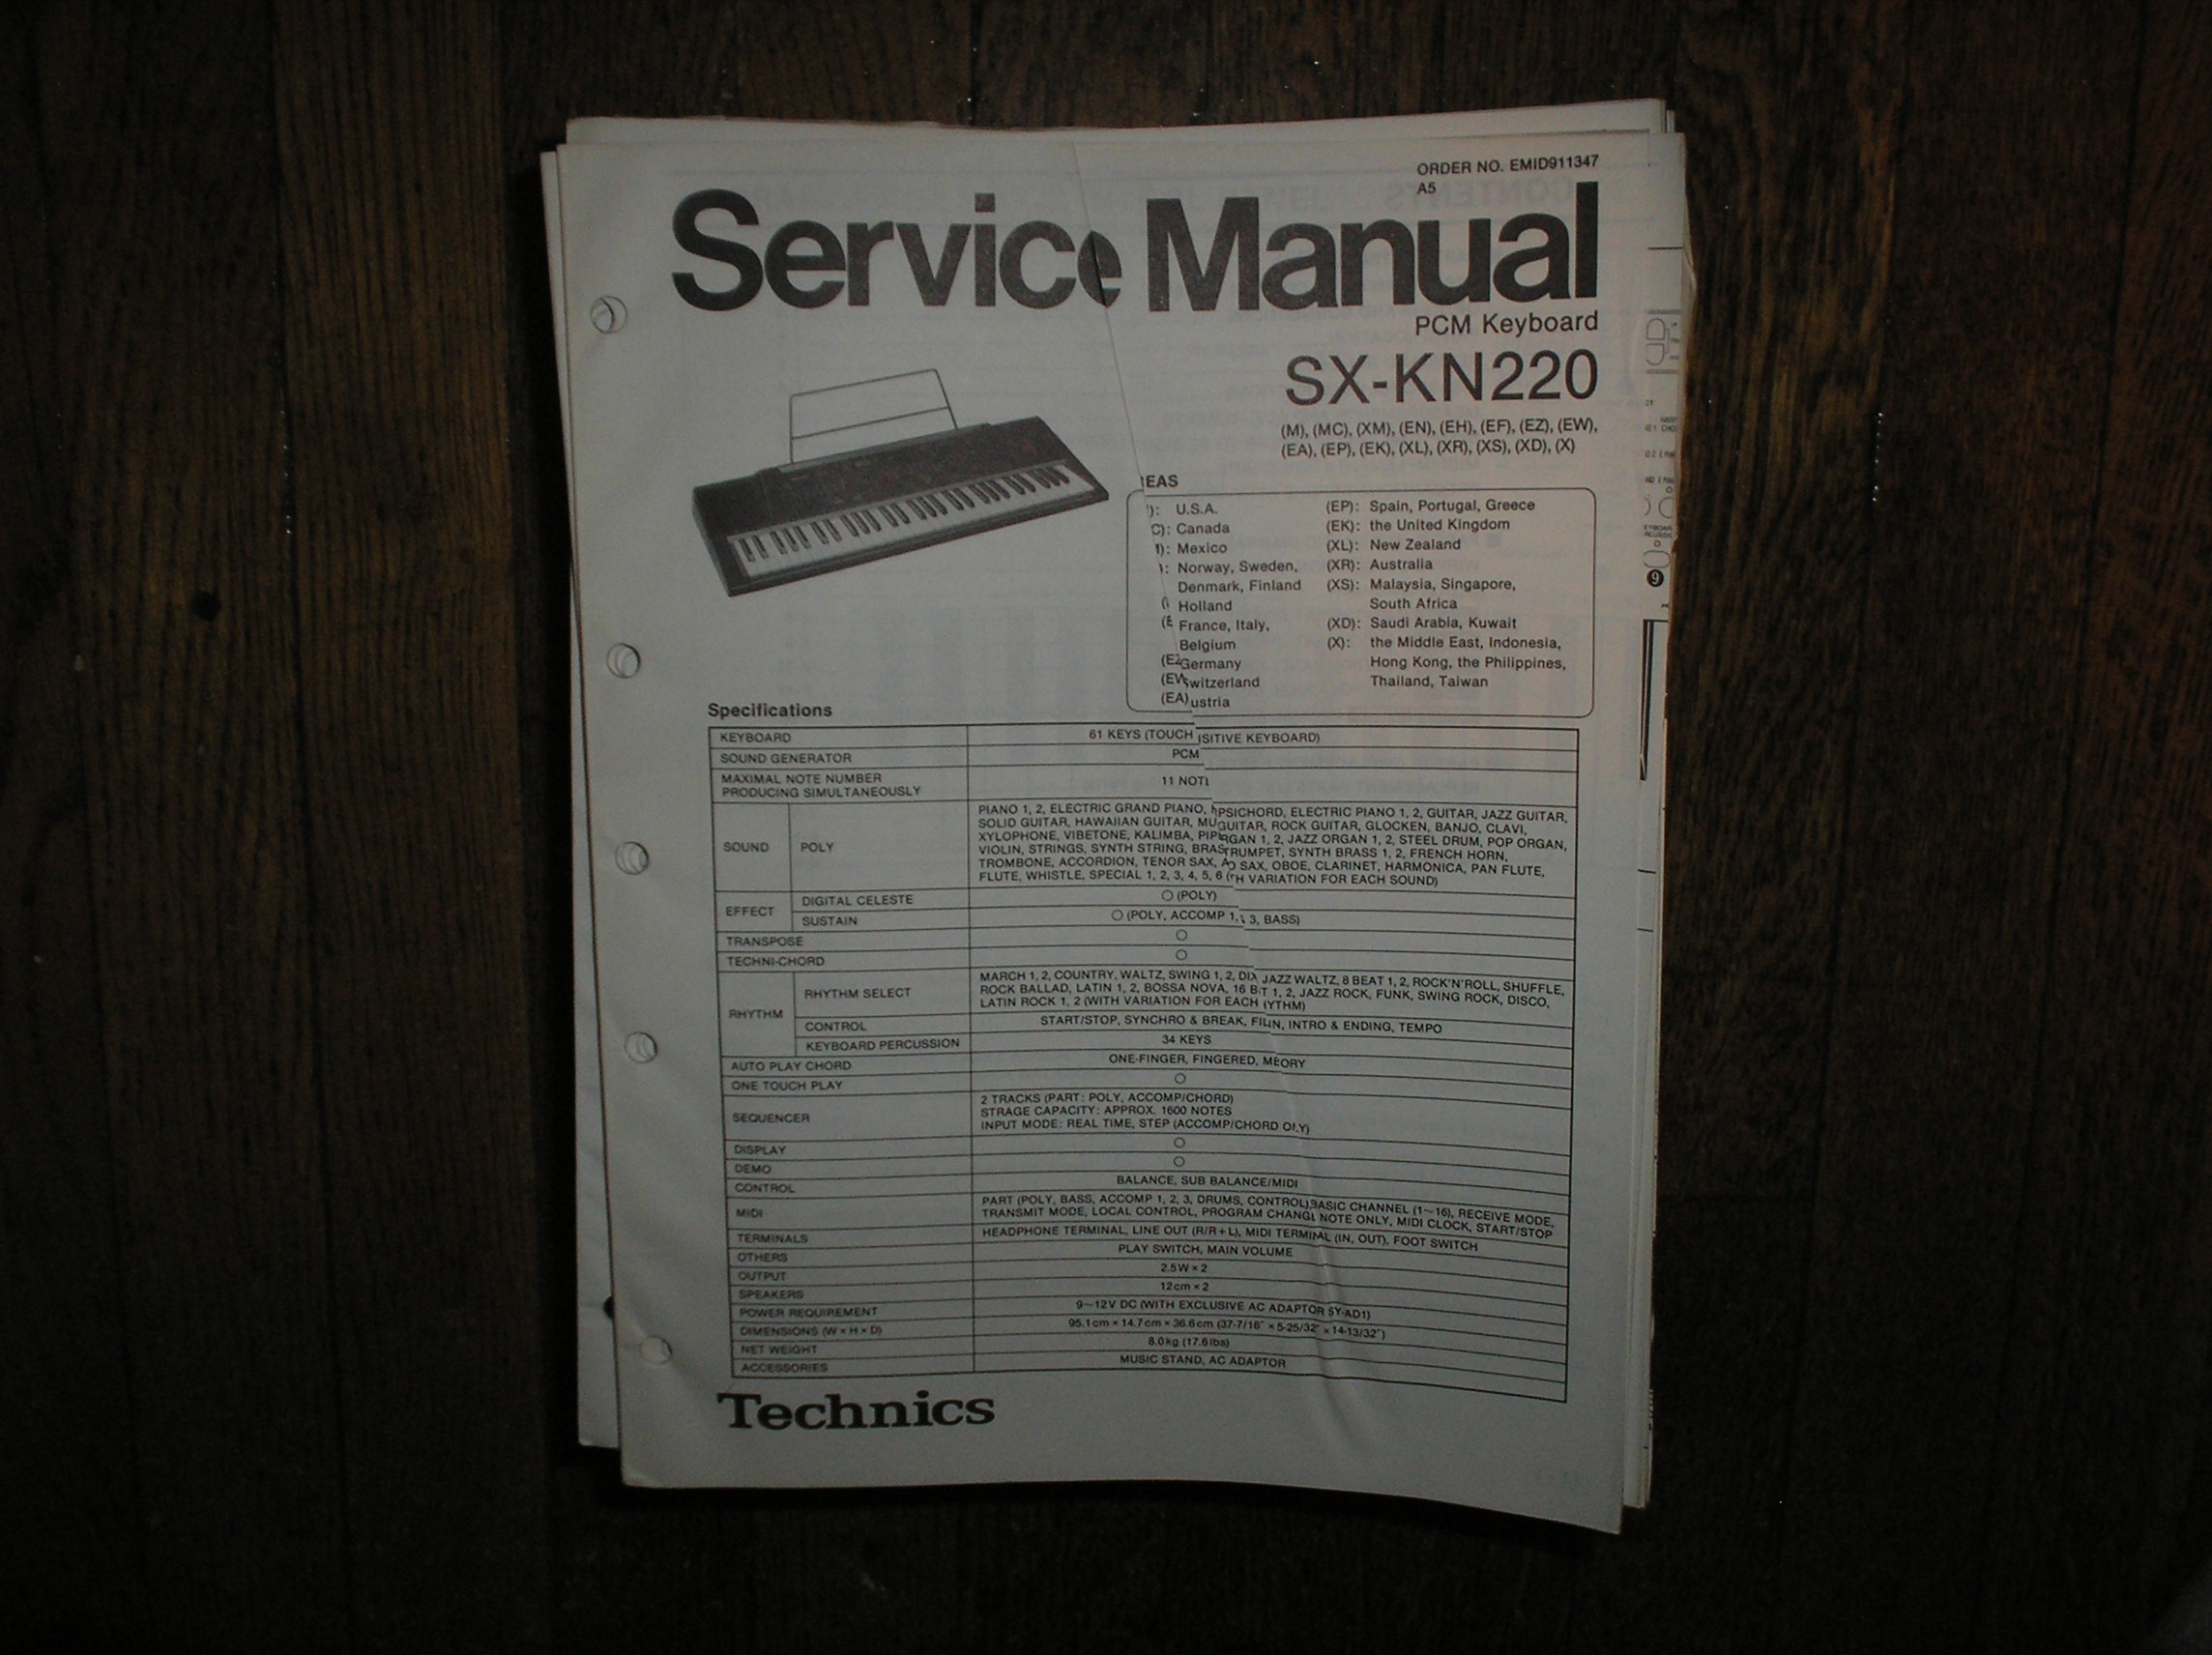 SX-KN220 PCM Keyboard Service Manual